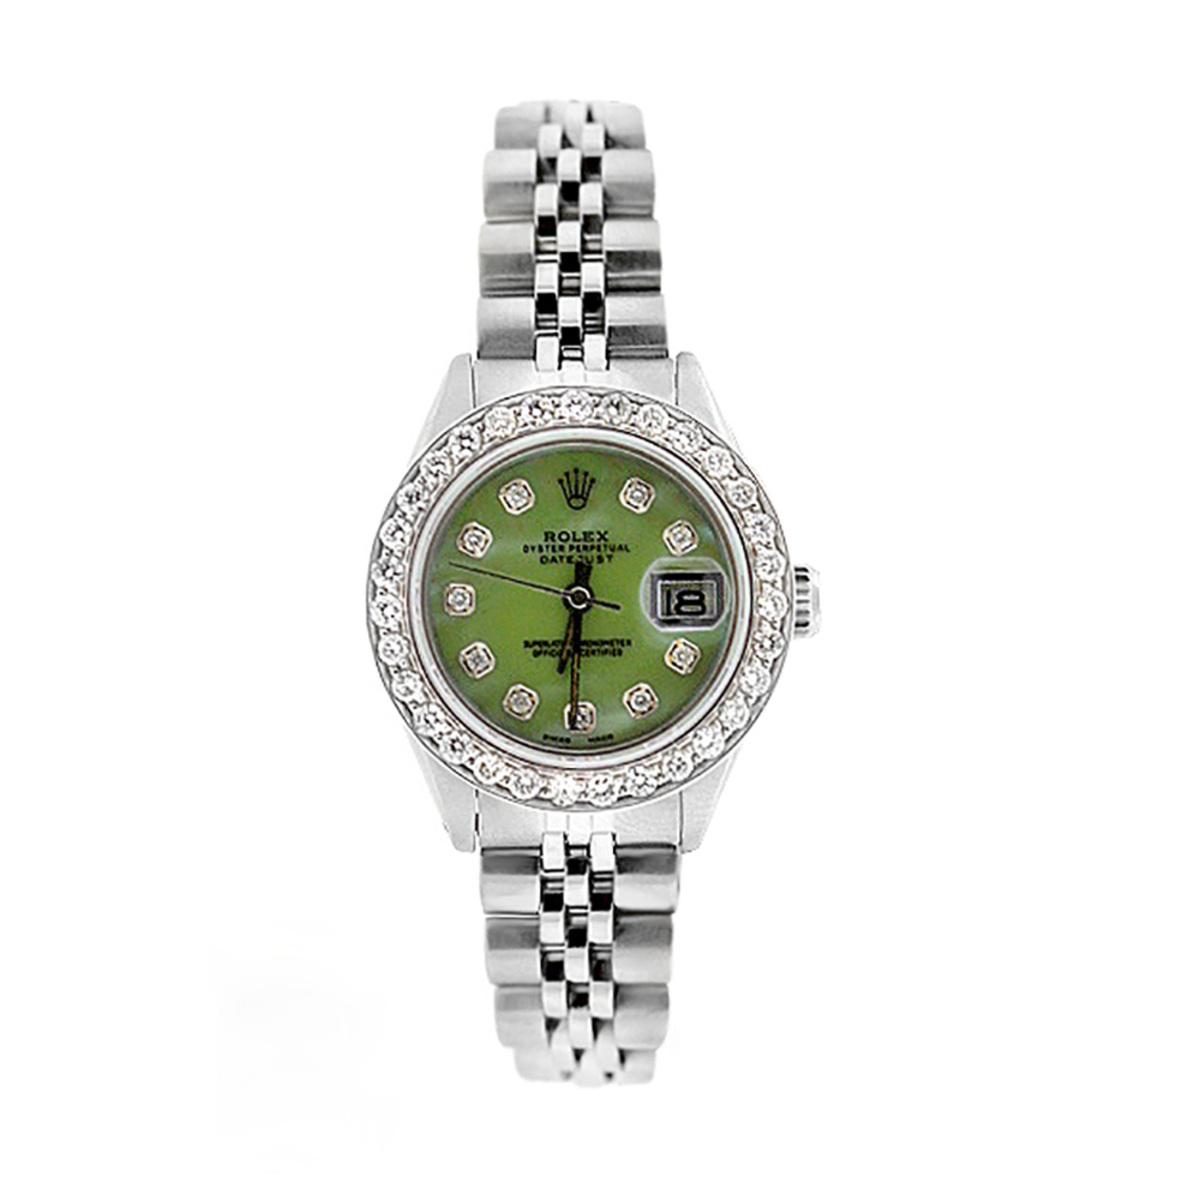 Ladies Rolex Datejust Diamond Bezel Watch Green MOP Dial 1.5ct